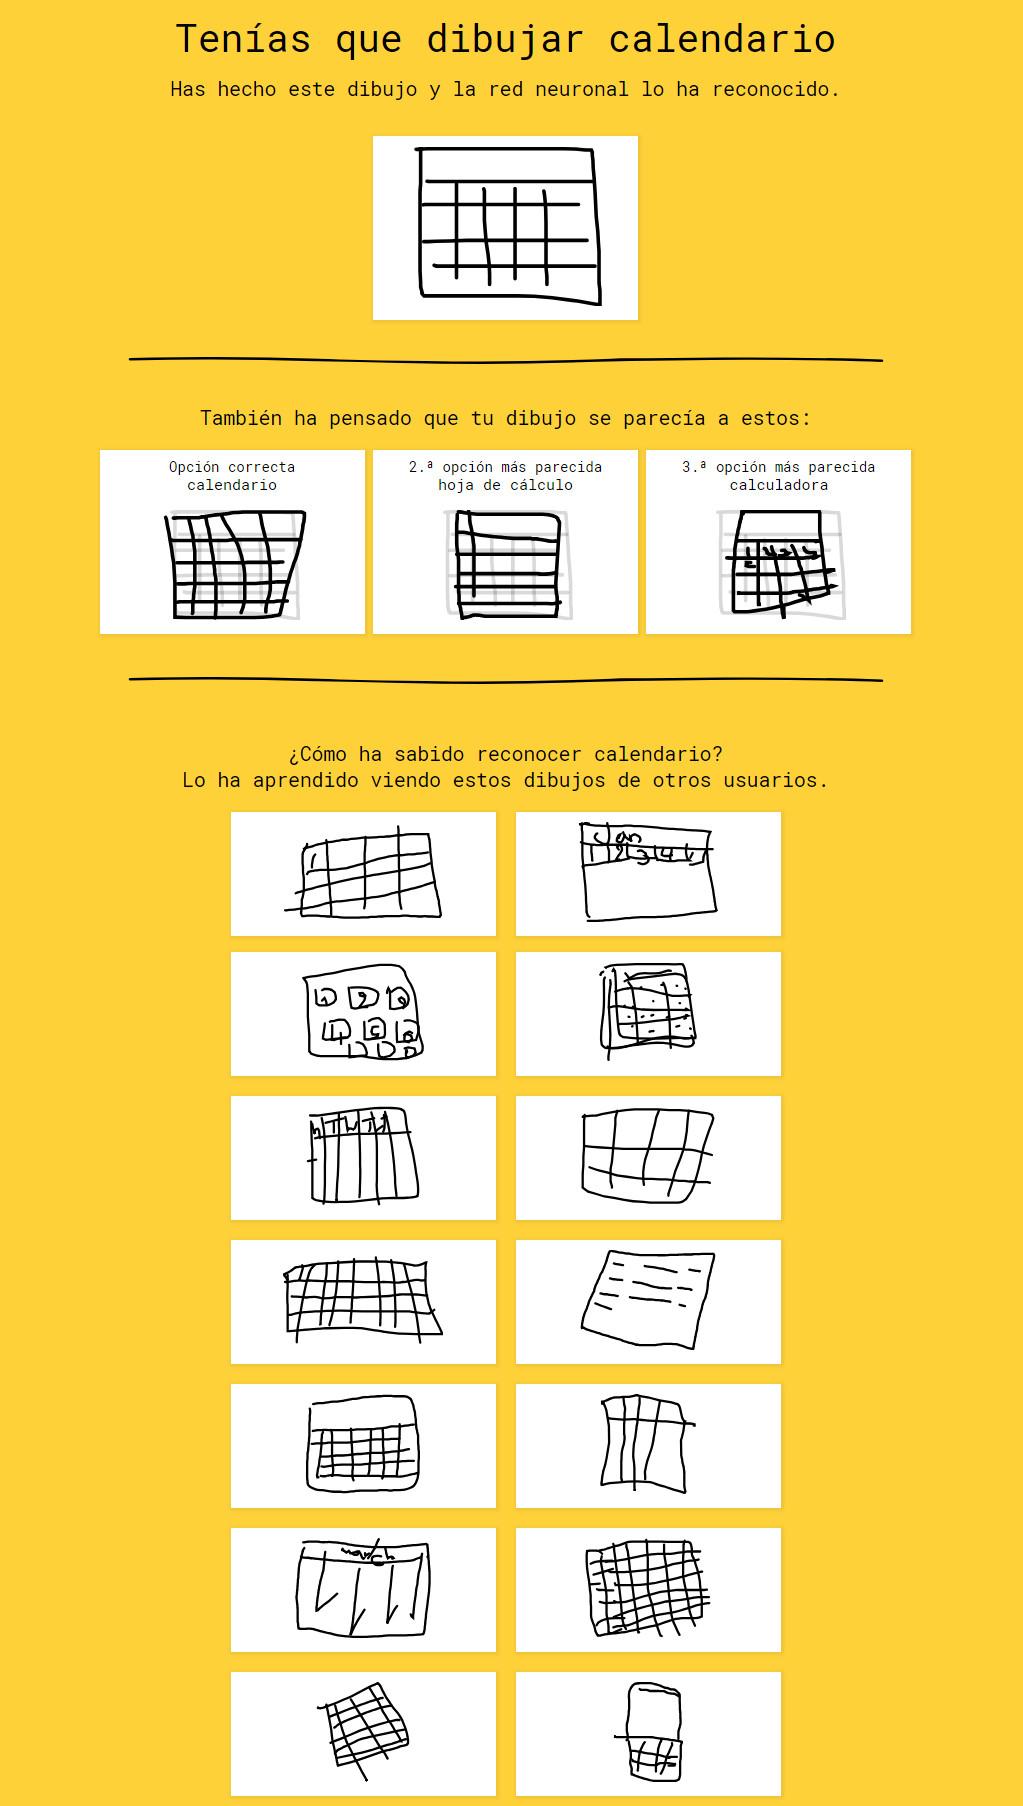 algoritmo-quick-draw-dibuja-calendario-red-neuronal